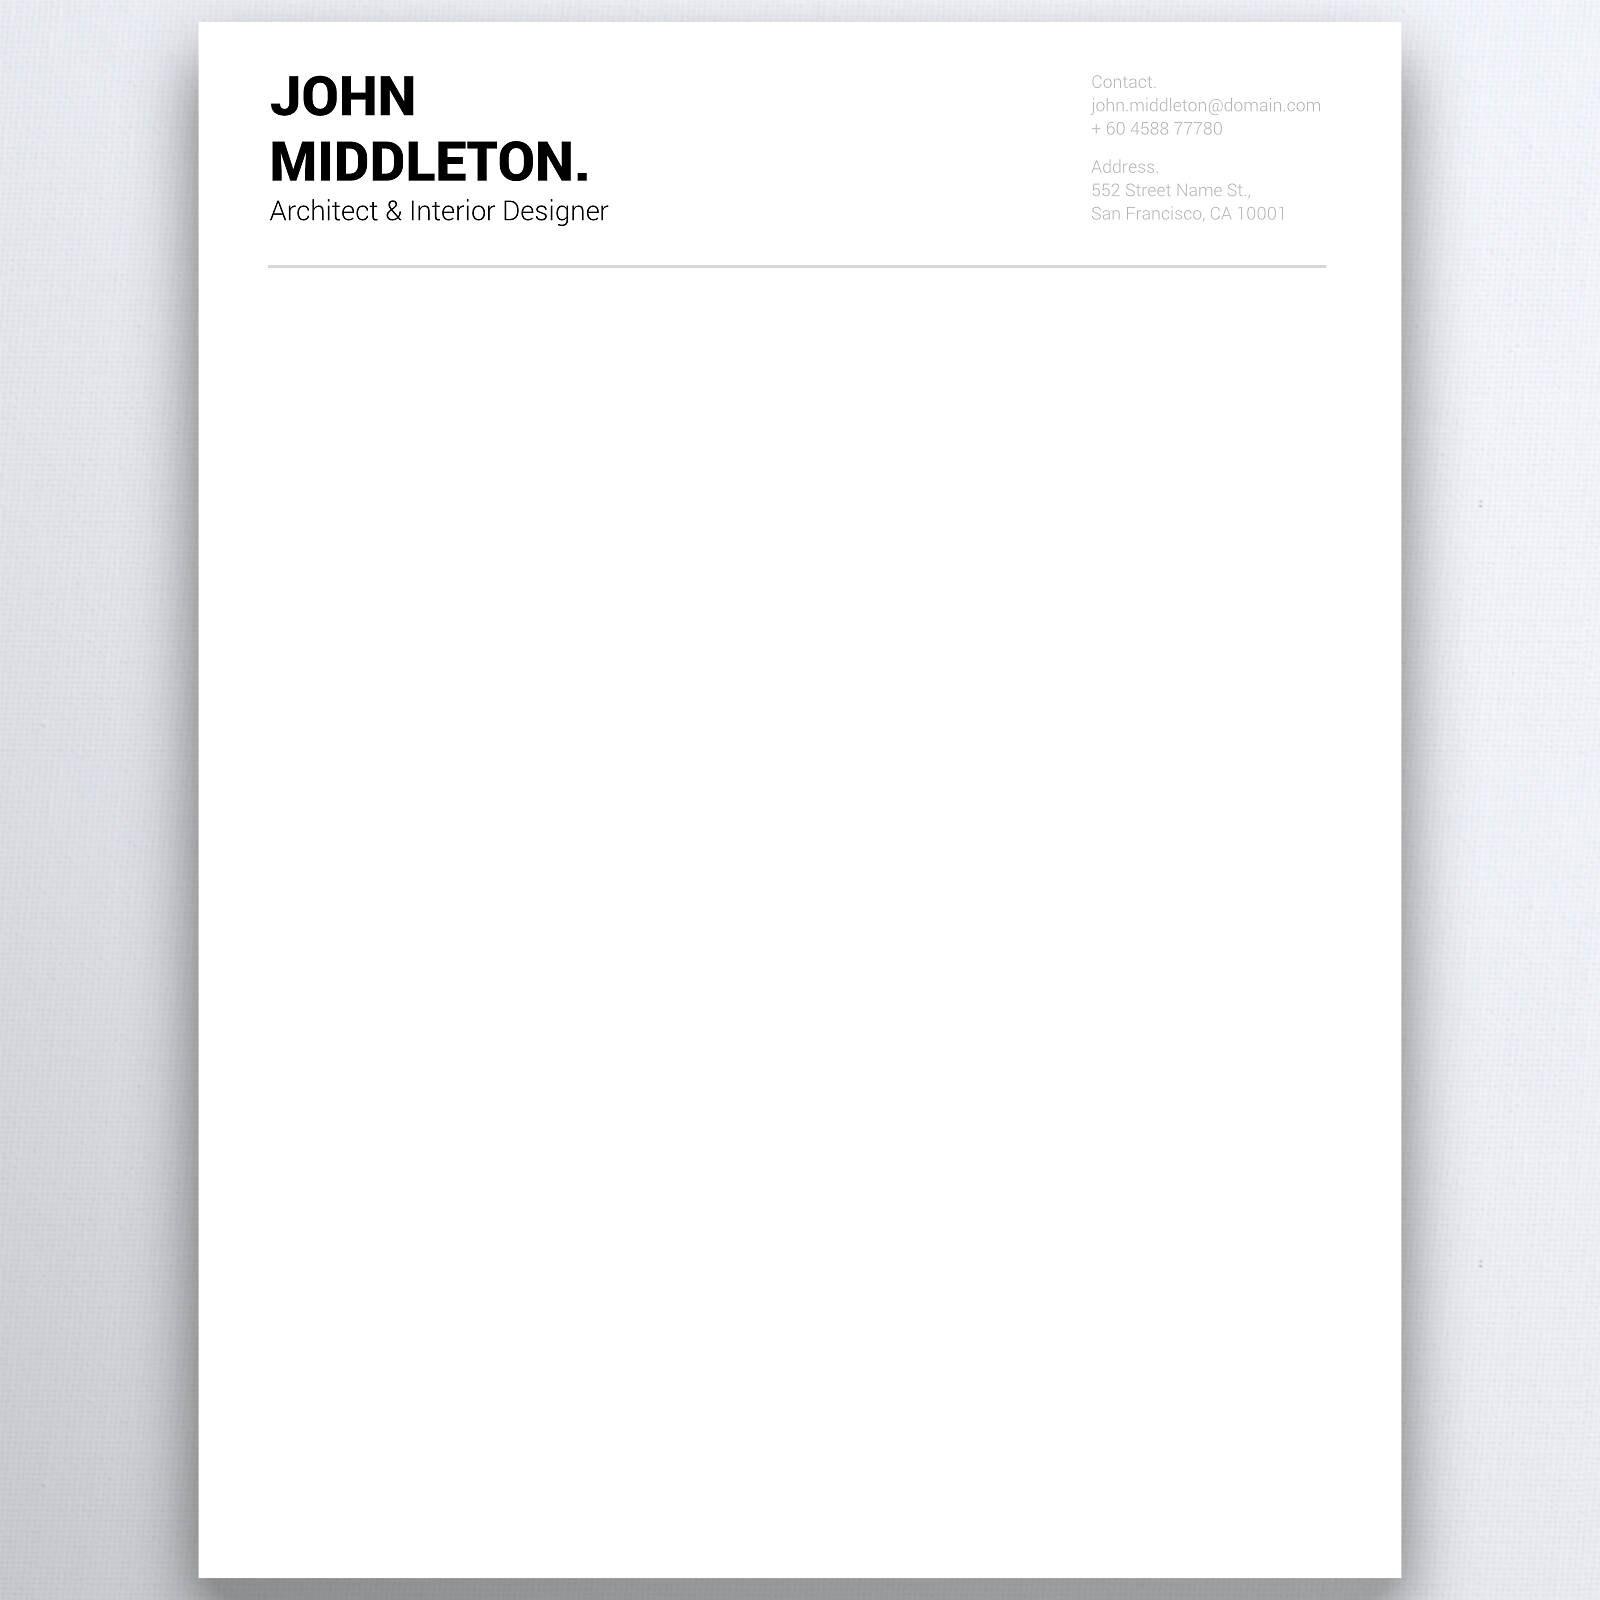 Business letterhead personal letterhead letterhead design zoom biocorpaavc Choice Image